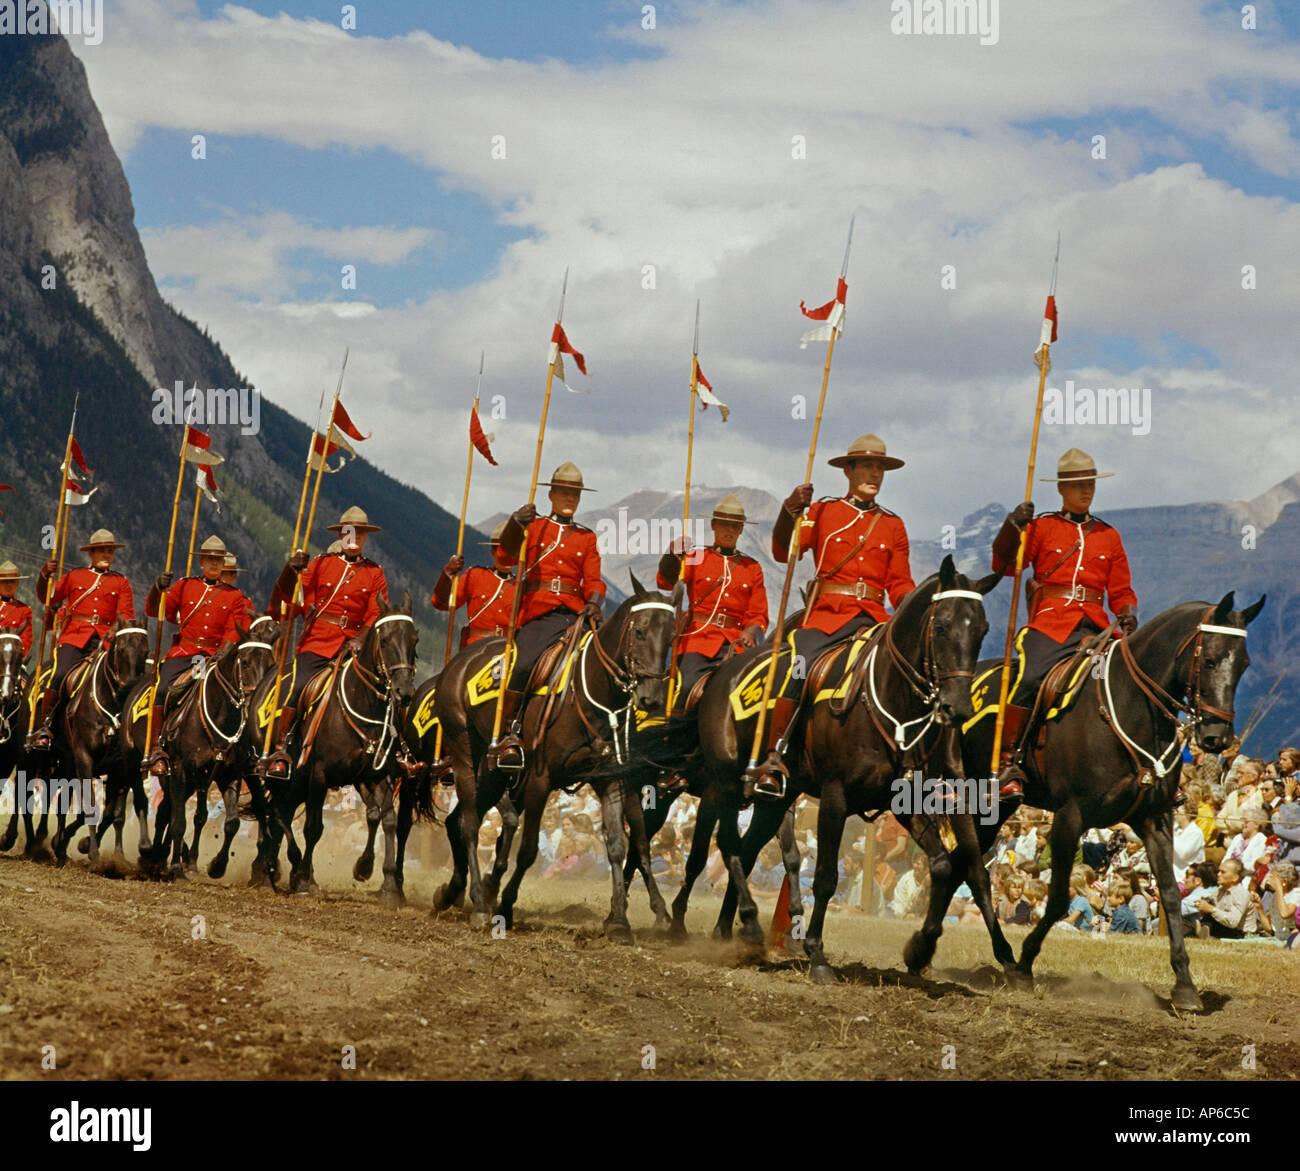 squad of Canadian Mounted Police on horseback with lances - Stock Image